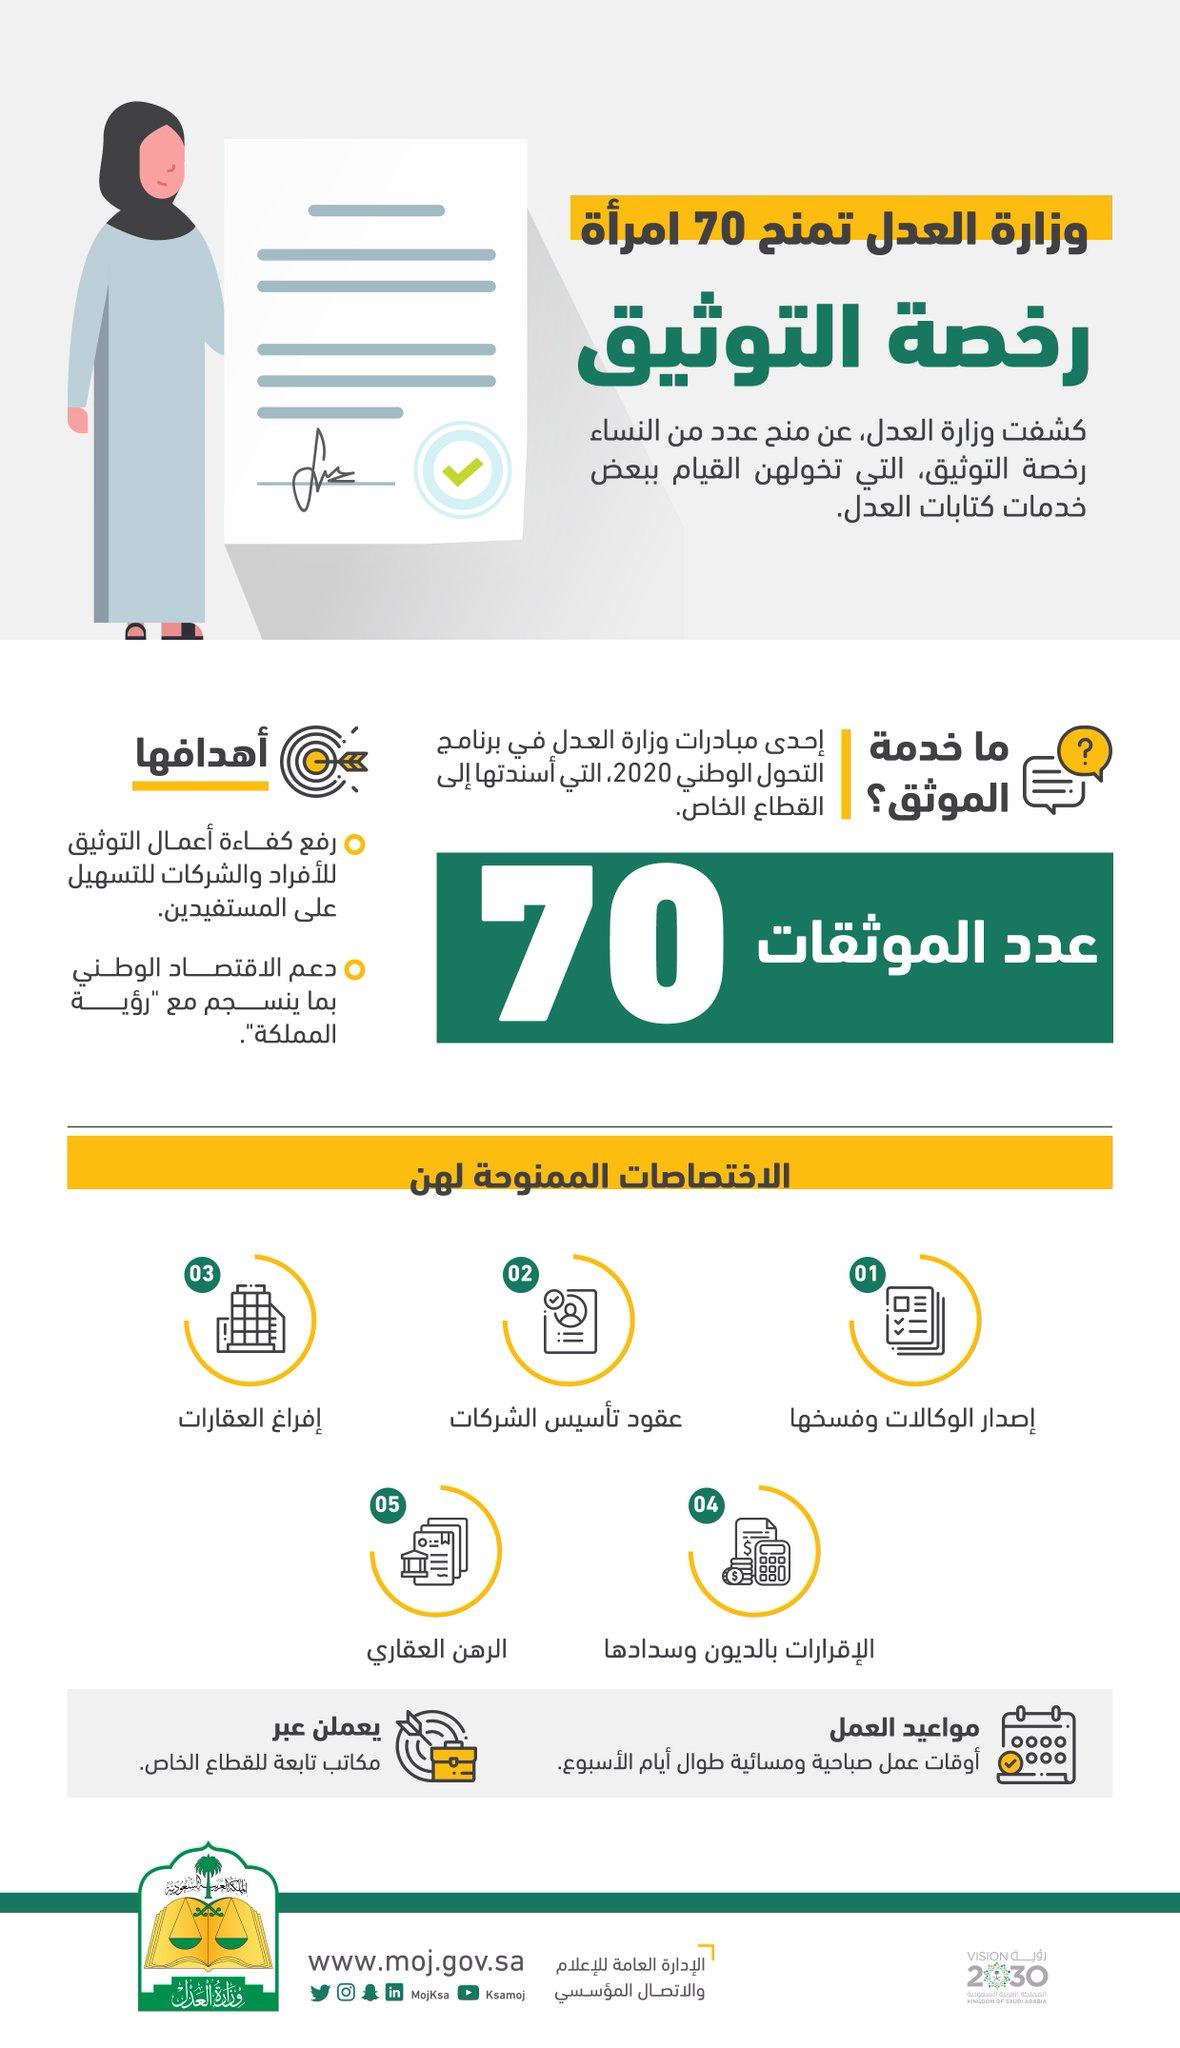 O Xrhsths وزارة العدل Sto Twitter وزارة العدل تمنح 70 امرأة رخصة التوثيق